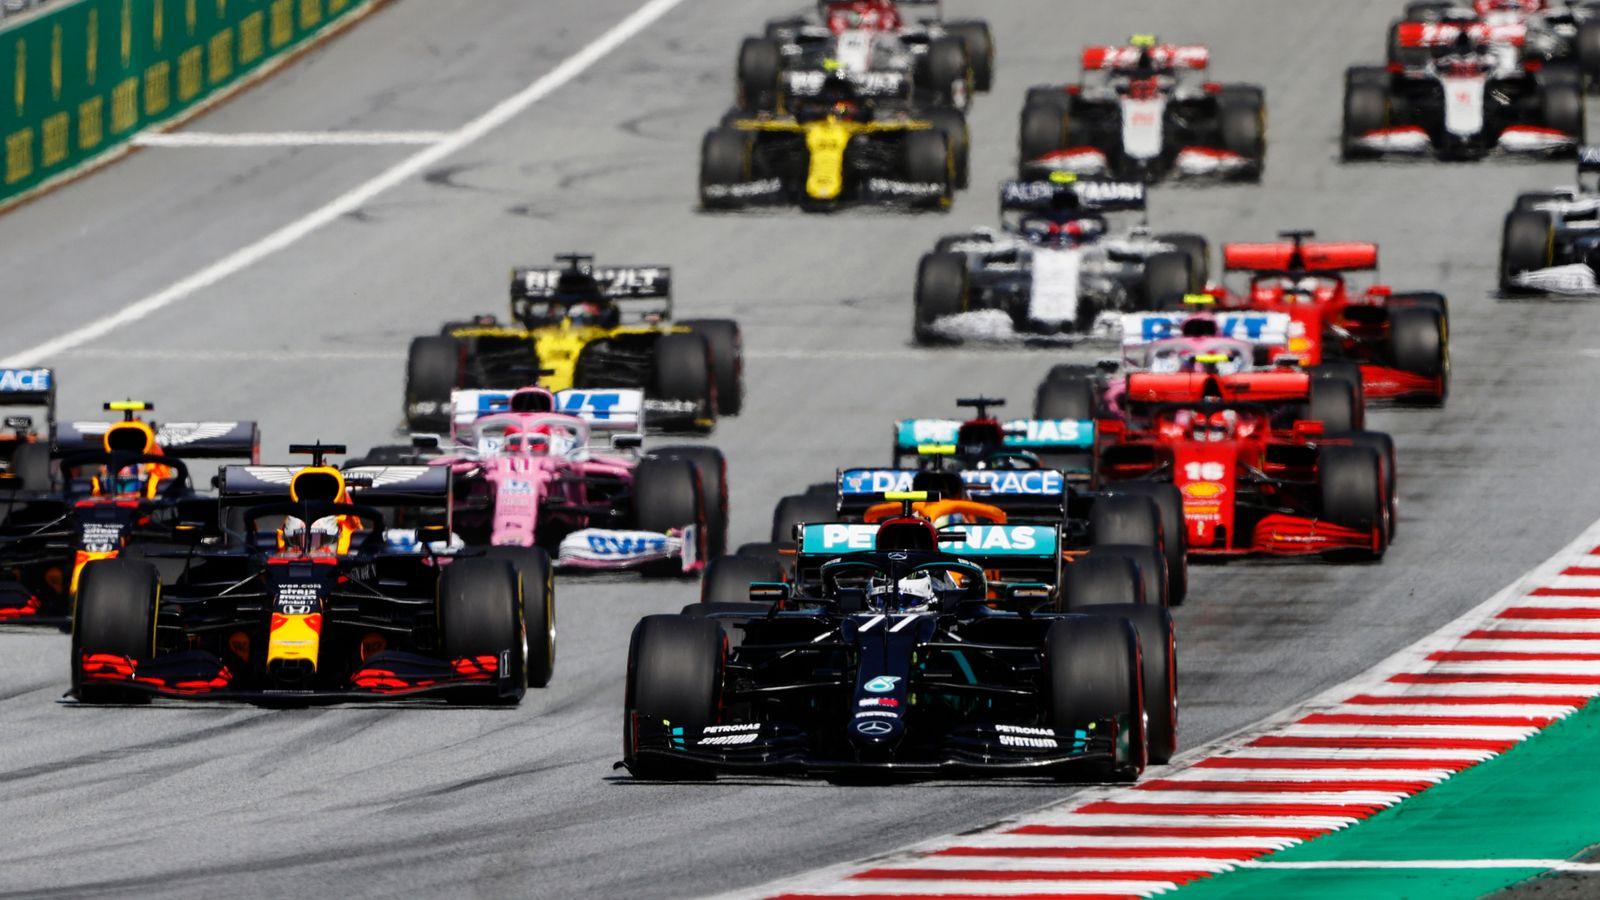 F1 Calendar: 2021 Season To Start With Bahrain Gp As Australia And China Races Postponed